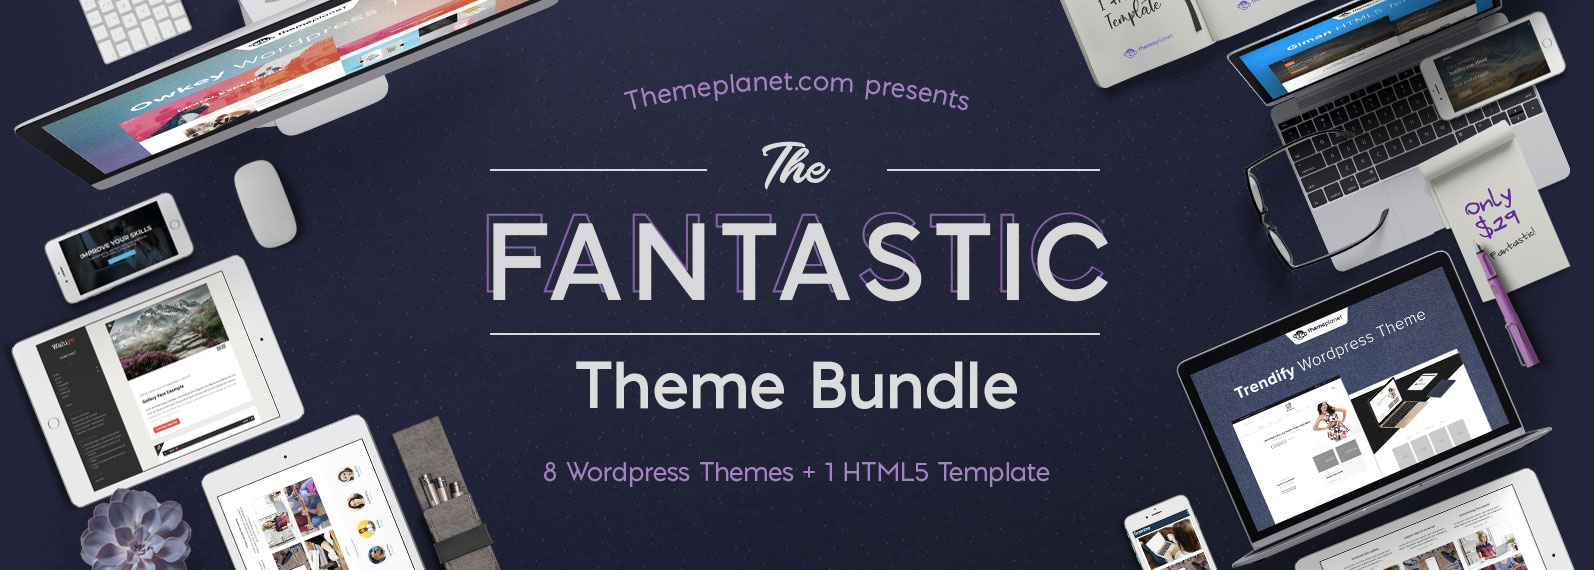 The Fantastic Theme Bundle Cover